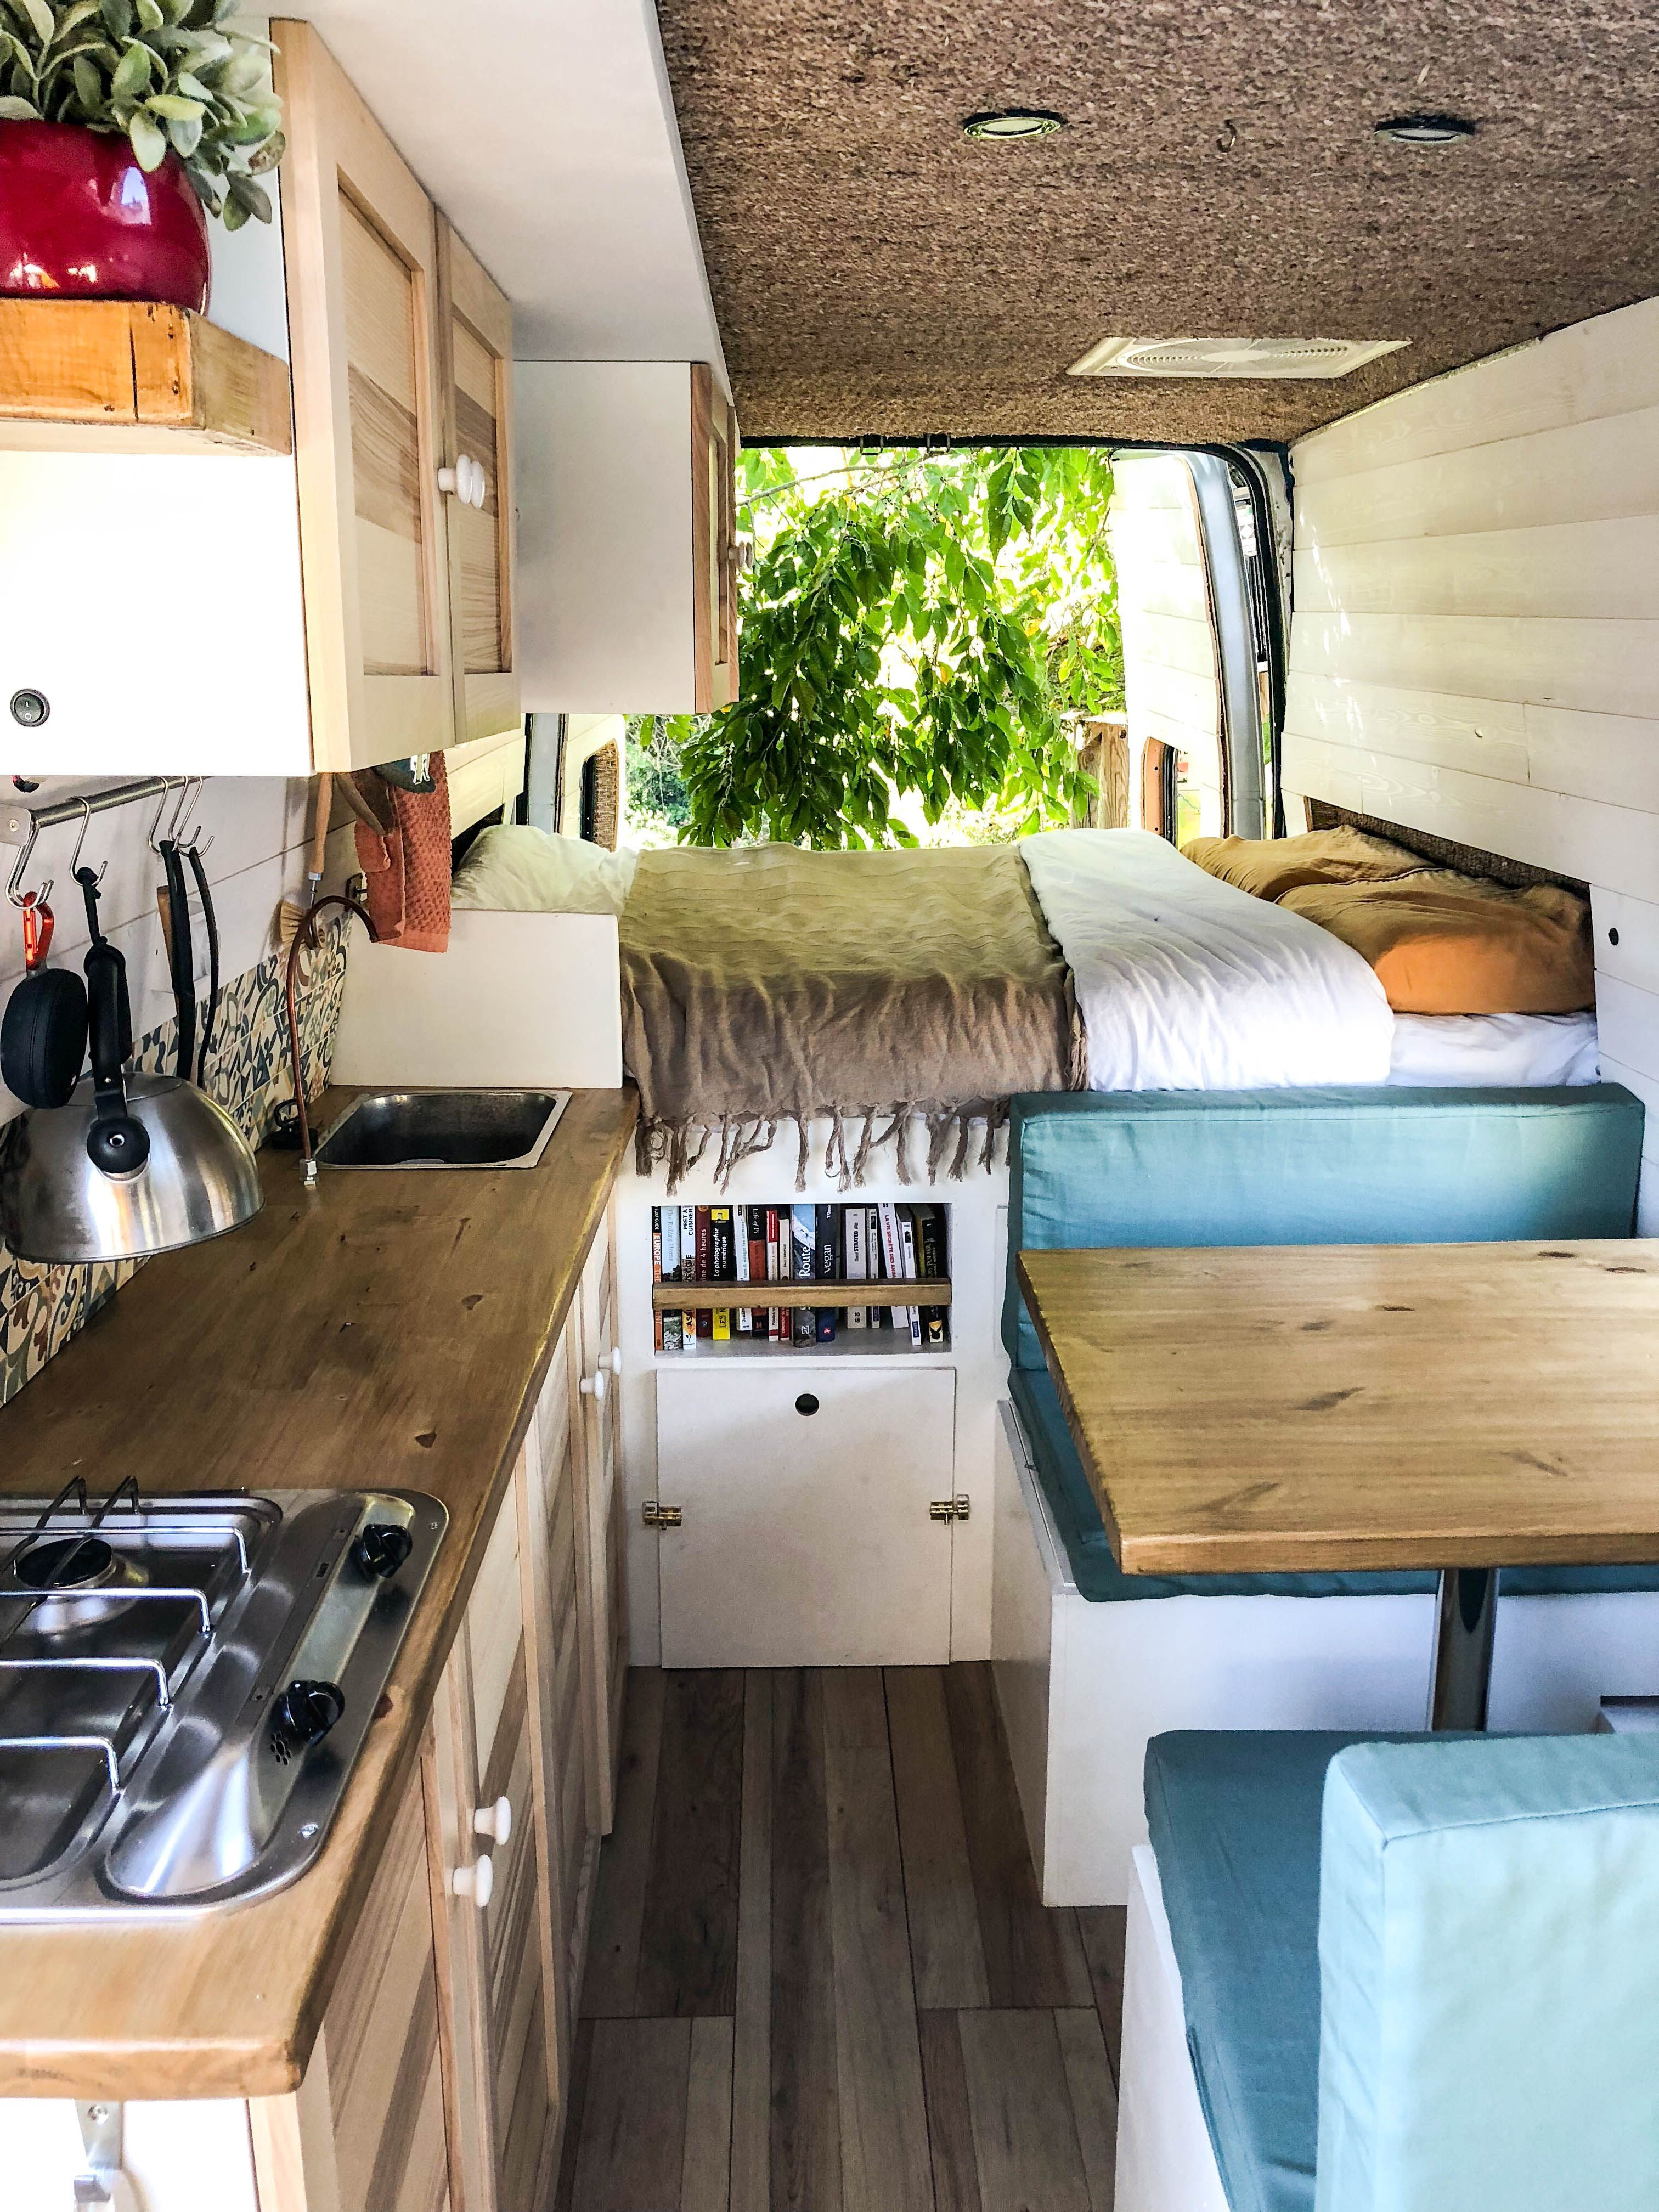 19 DIY Camper Van Remodel Inspirations Transit camper